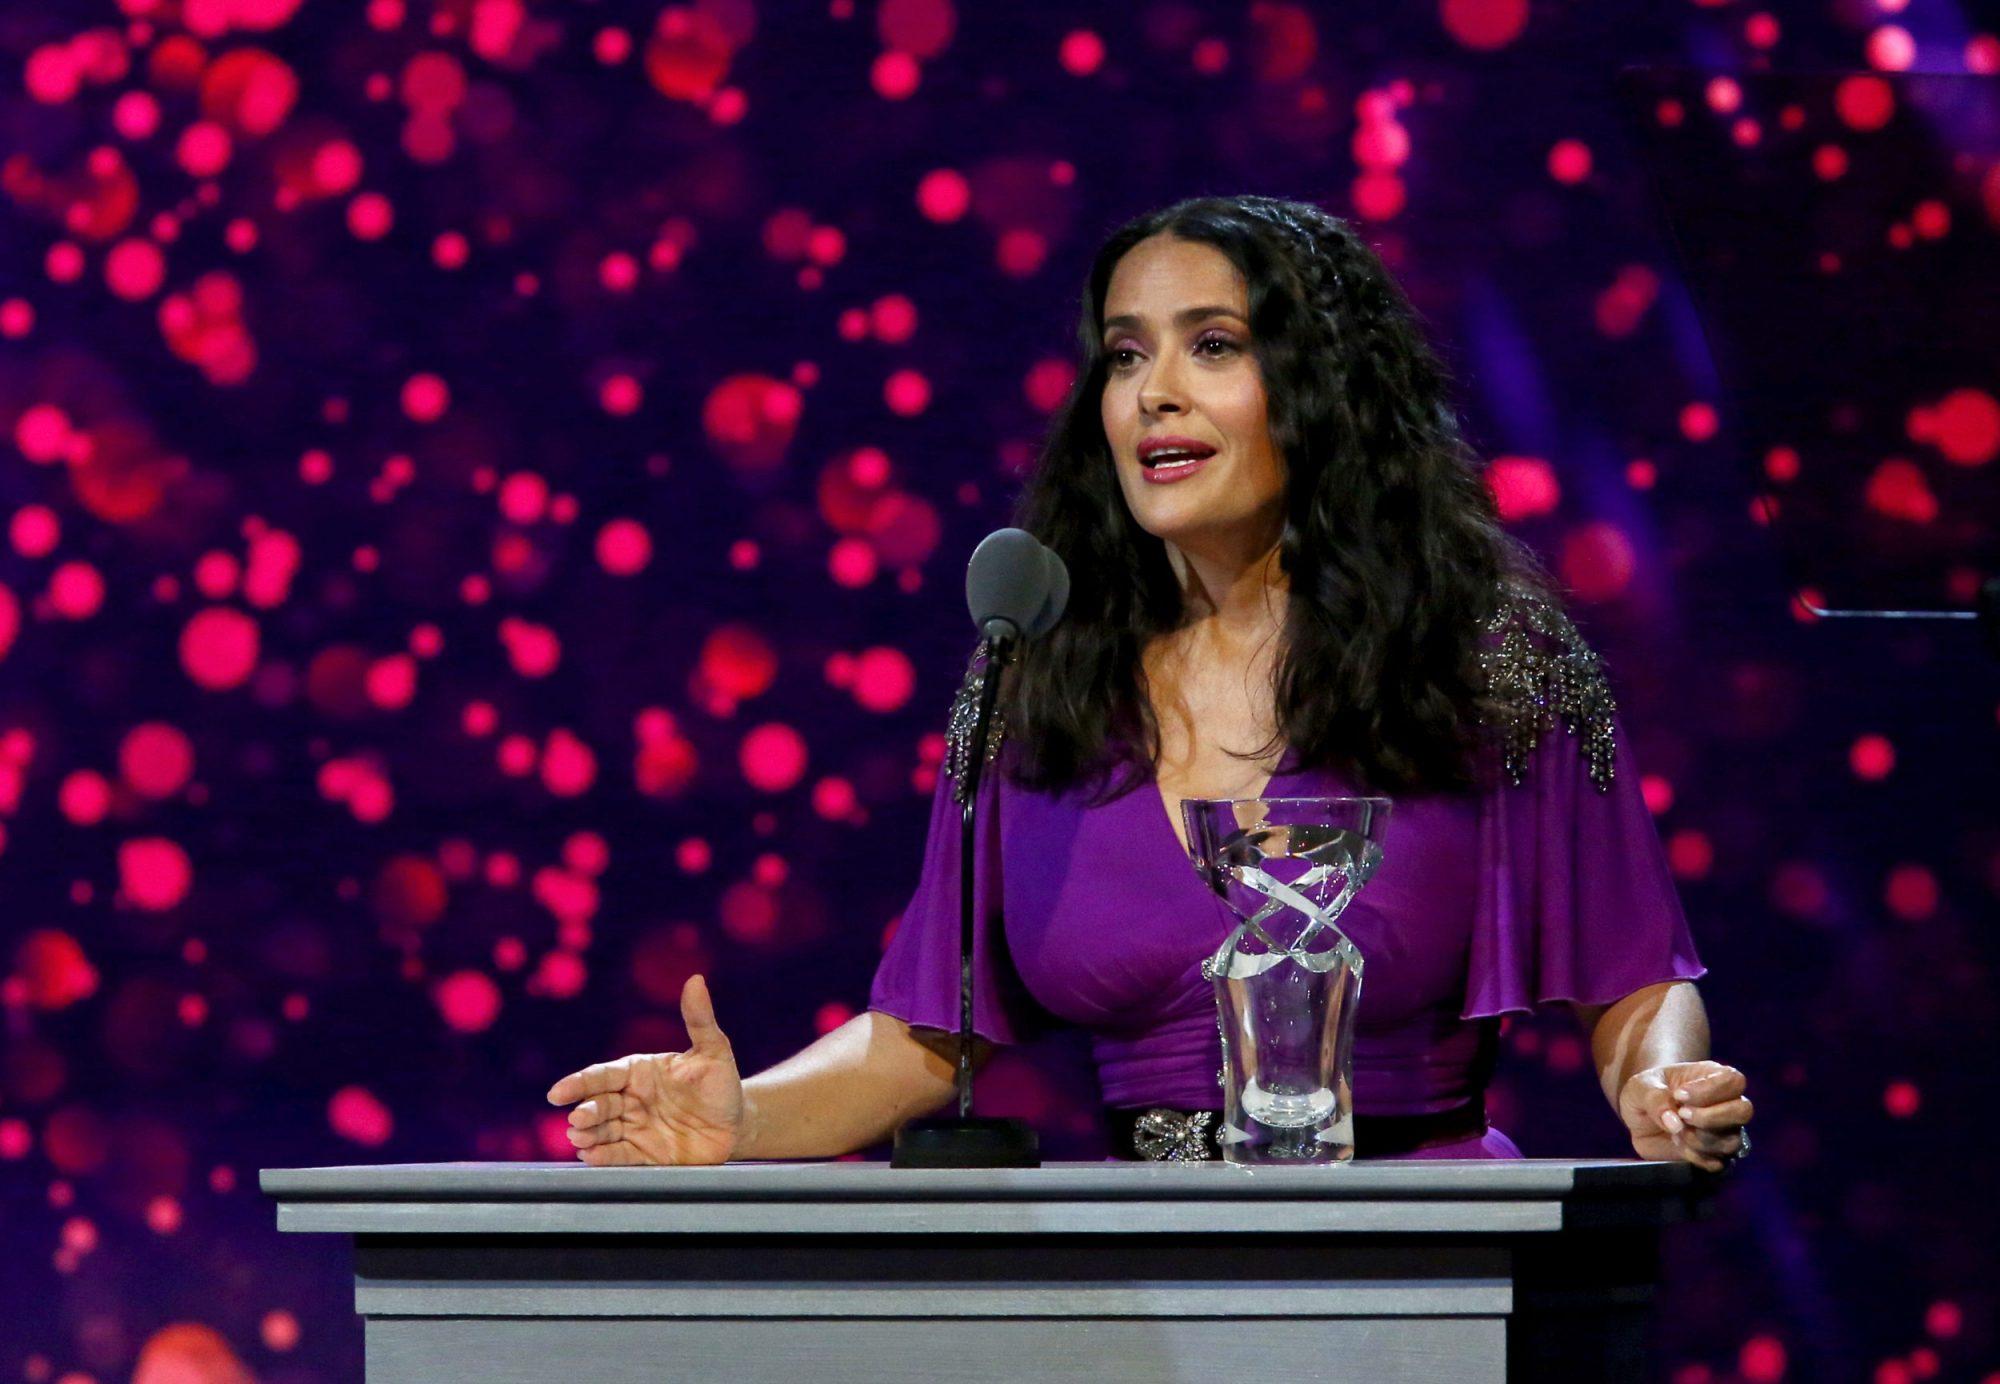 Photo of Salma Hayek Pinault at 7th Biennial UNICEF Ball